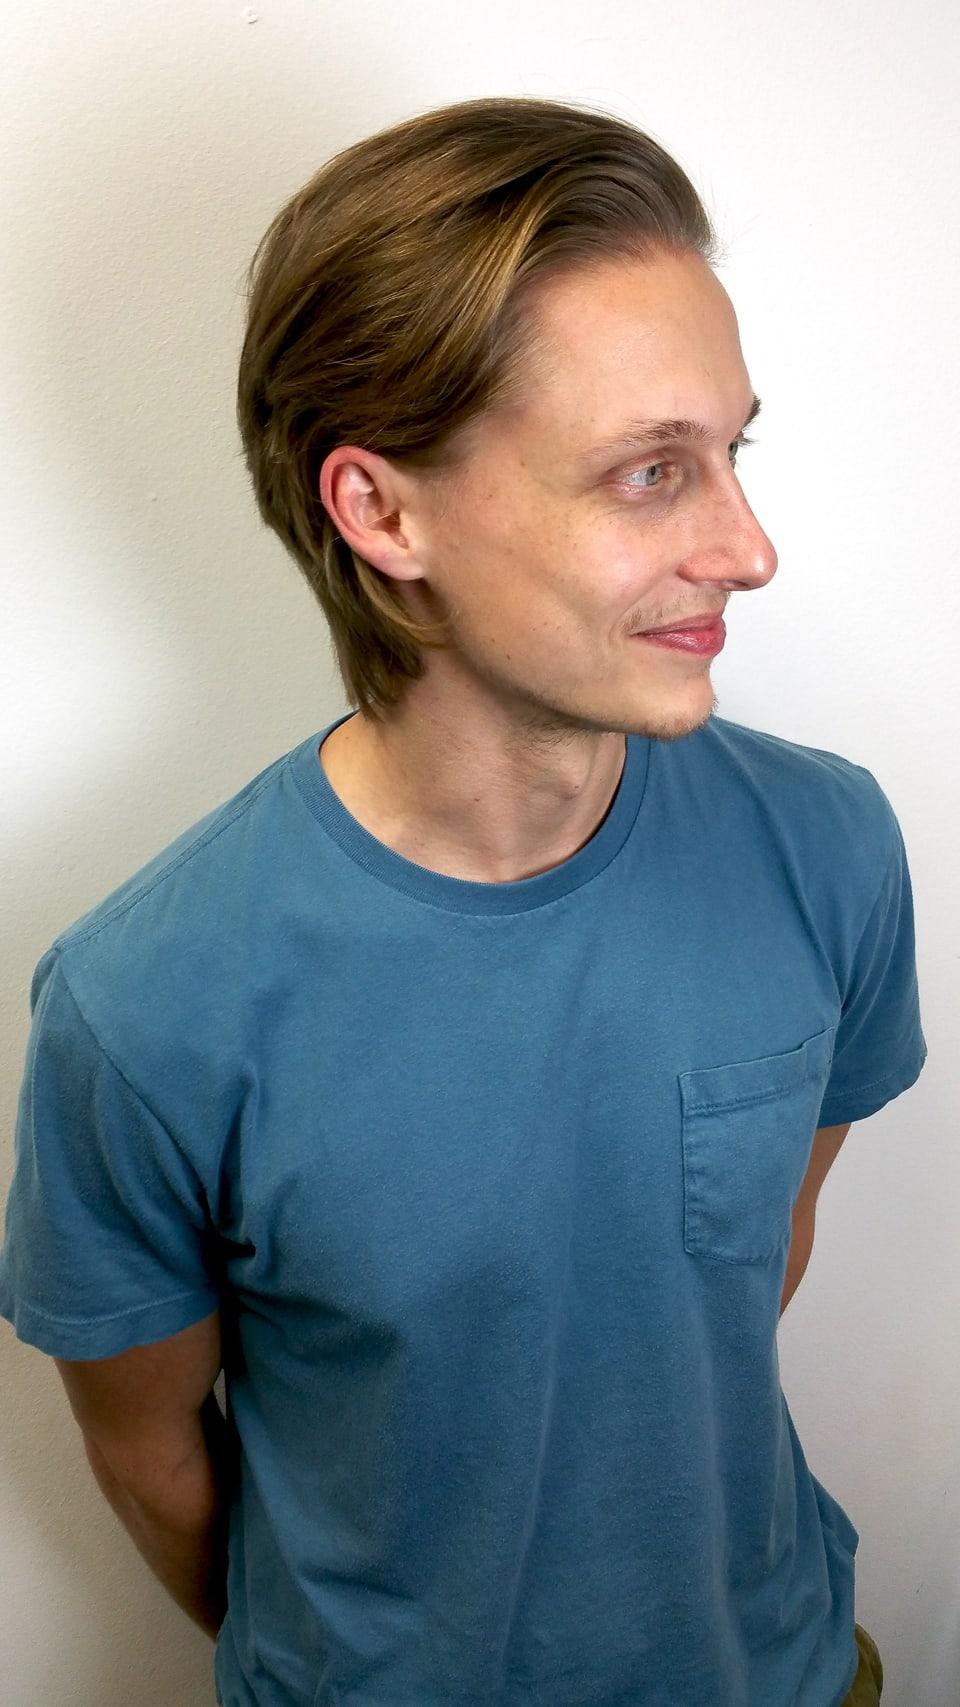 Mens haircut Tampa After Tribeca Salon South Tampa